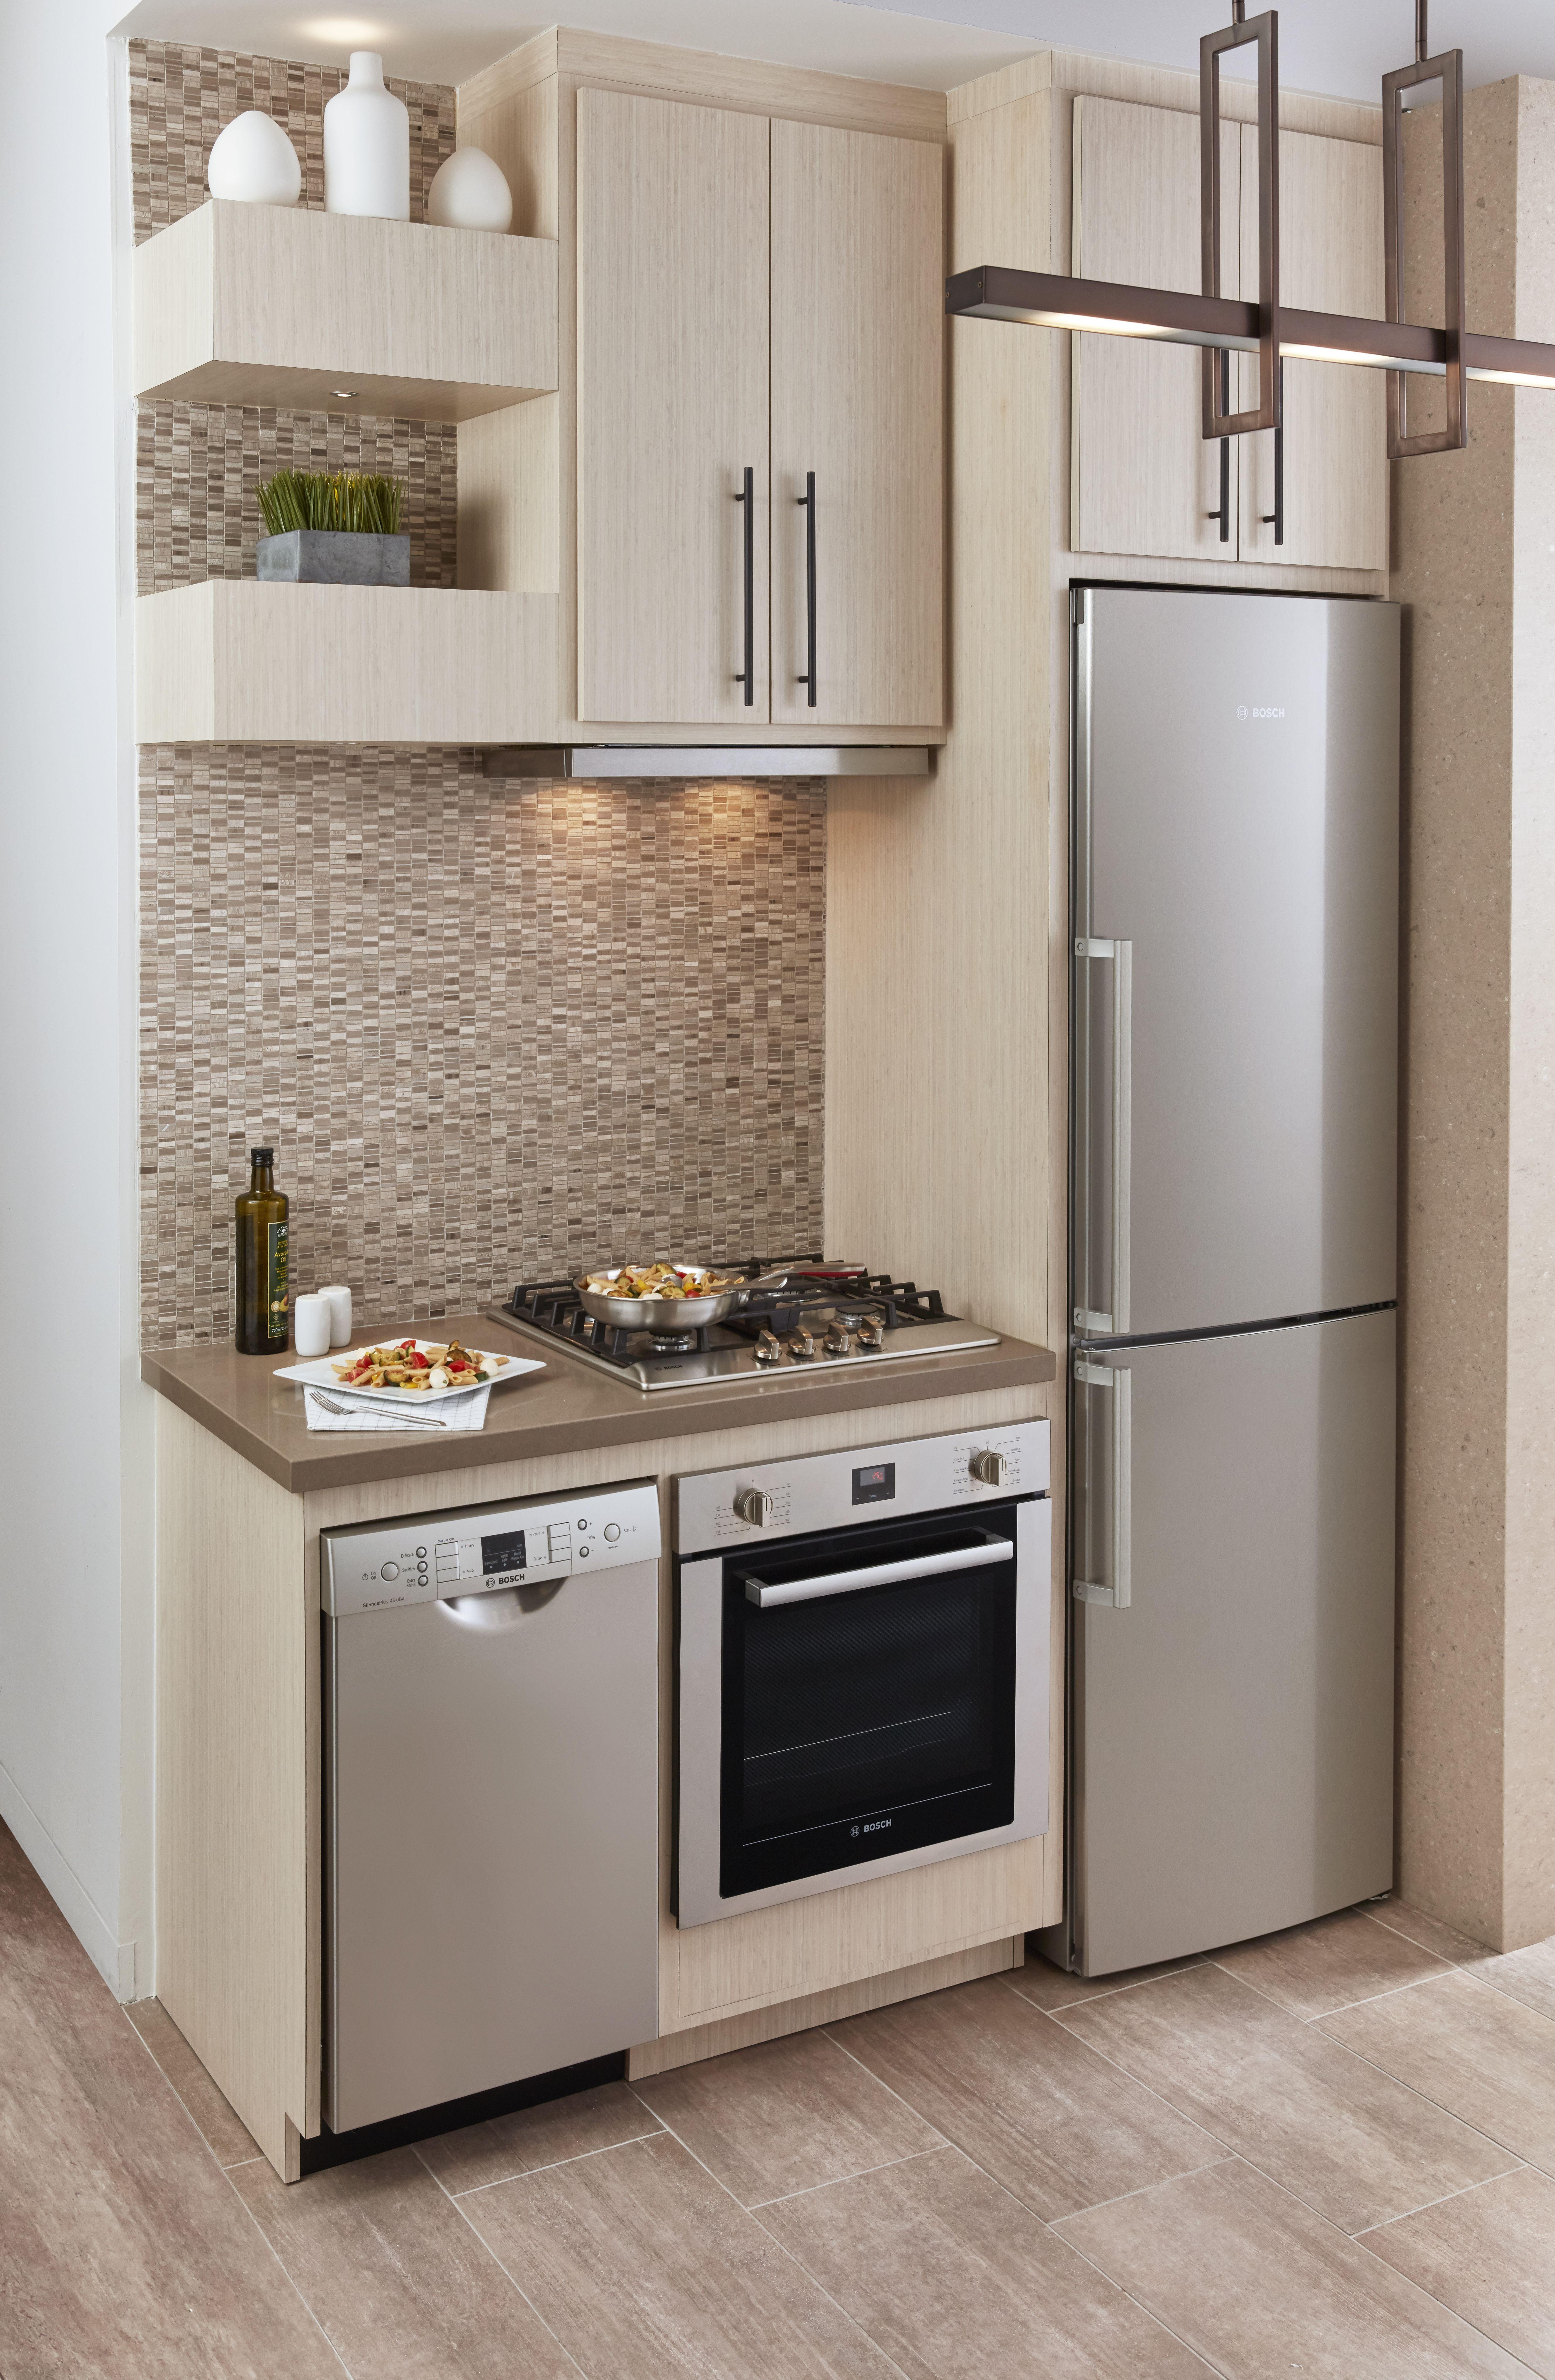 hi tech kitchen tiny house kitchen kitchen remodel small kitchen design small on small kaboodle kitchen ideas id=75235